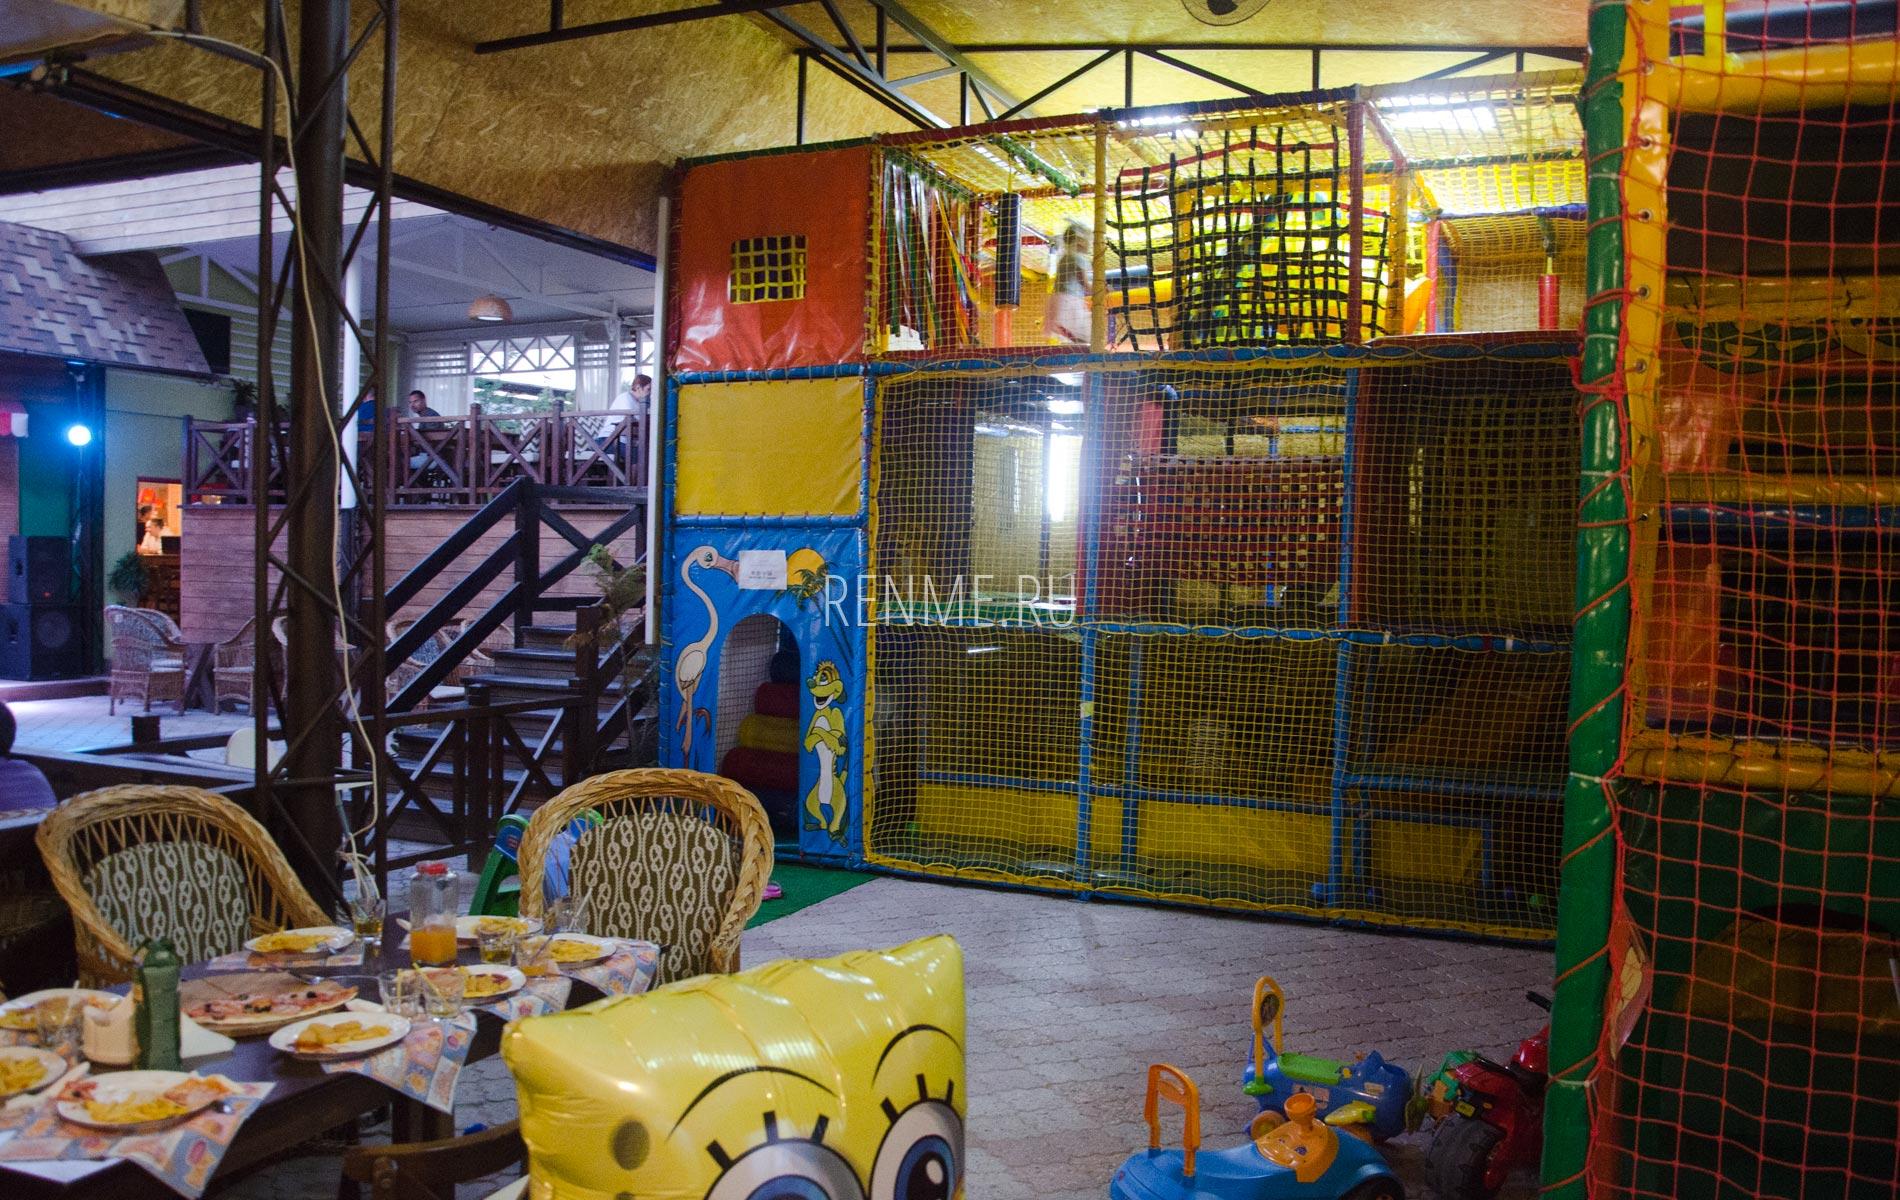 Кафе Аркадия с детским лабиринтом. Фото Заозёрного